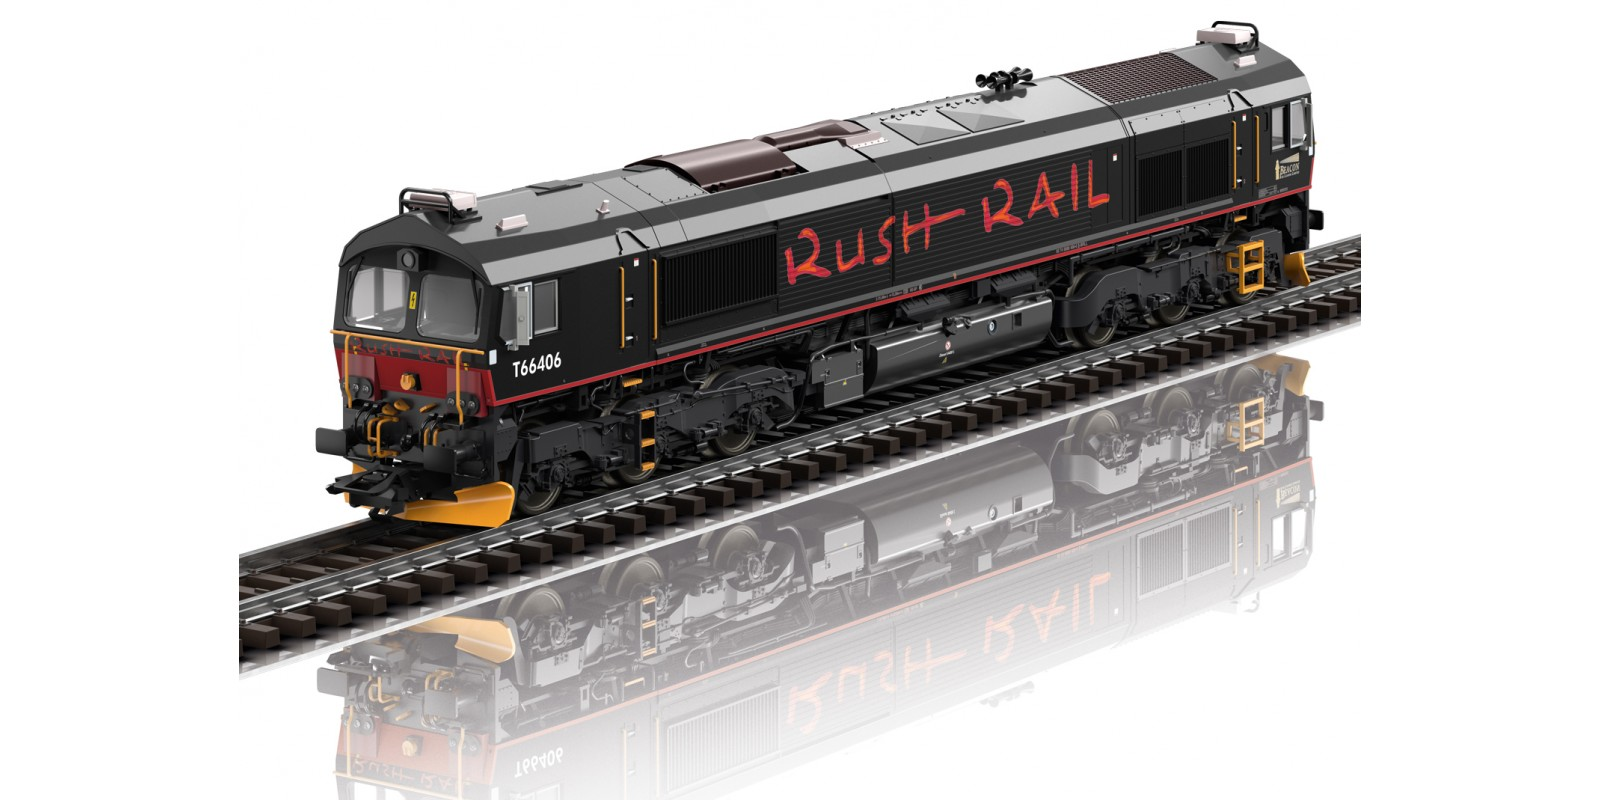 39068 Class 66 Diesel Locomotive